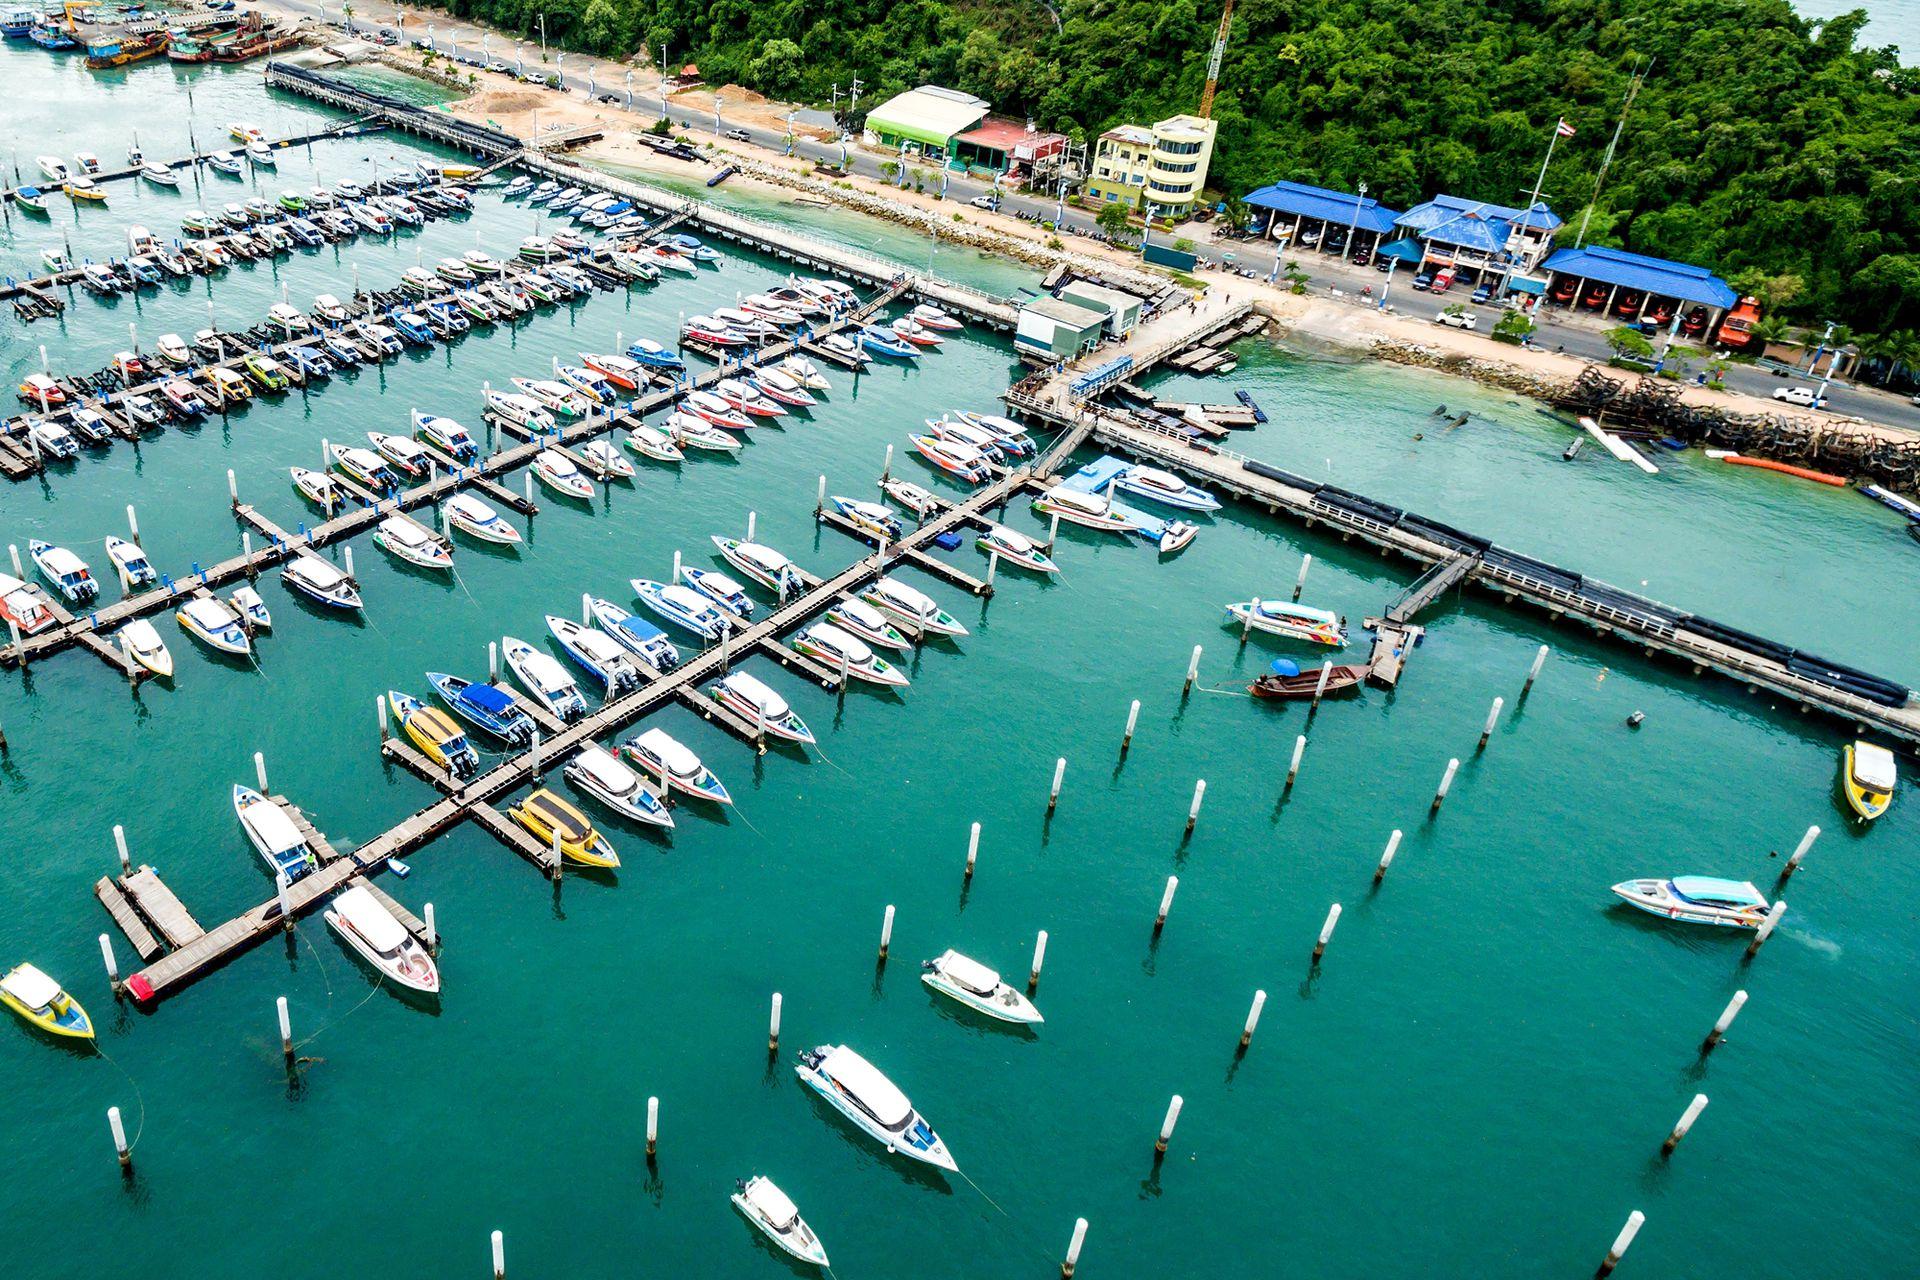 La marina que alberga yates de lujo en Pattaya, provincia de Chonburi